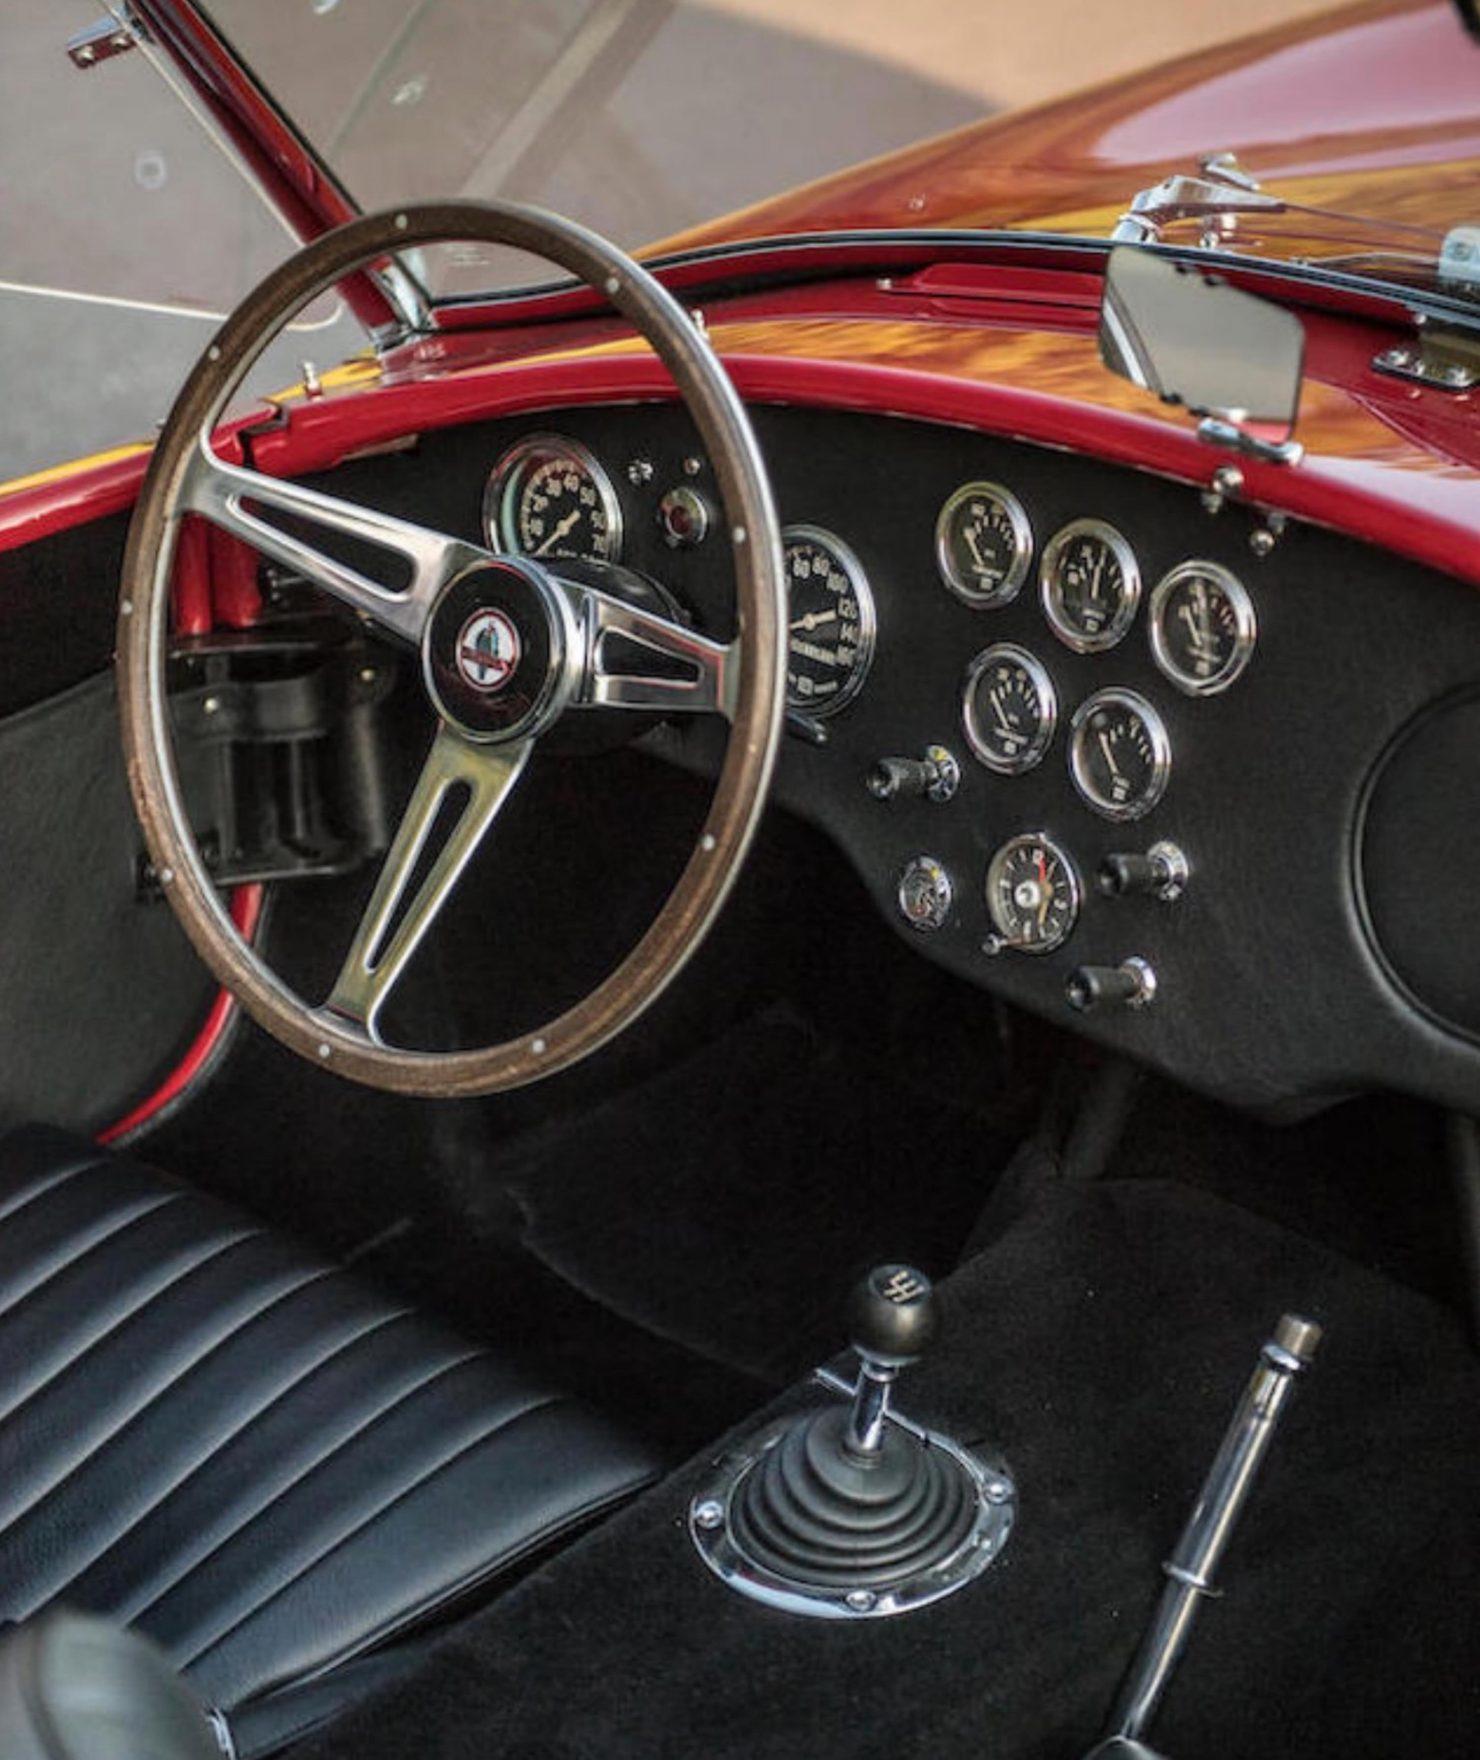 shelby ac cobra 289 13 1480x1760 - 1964 Shelby AC Cobra 289